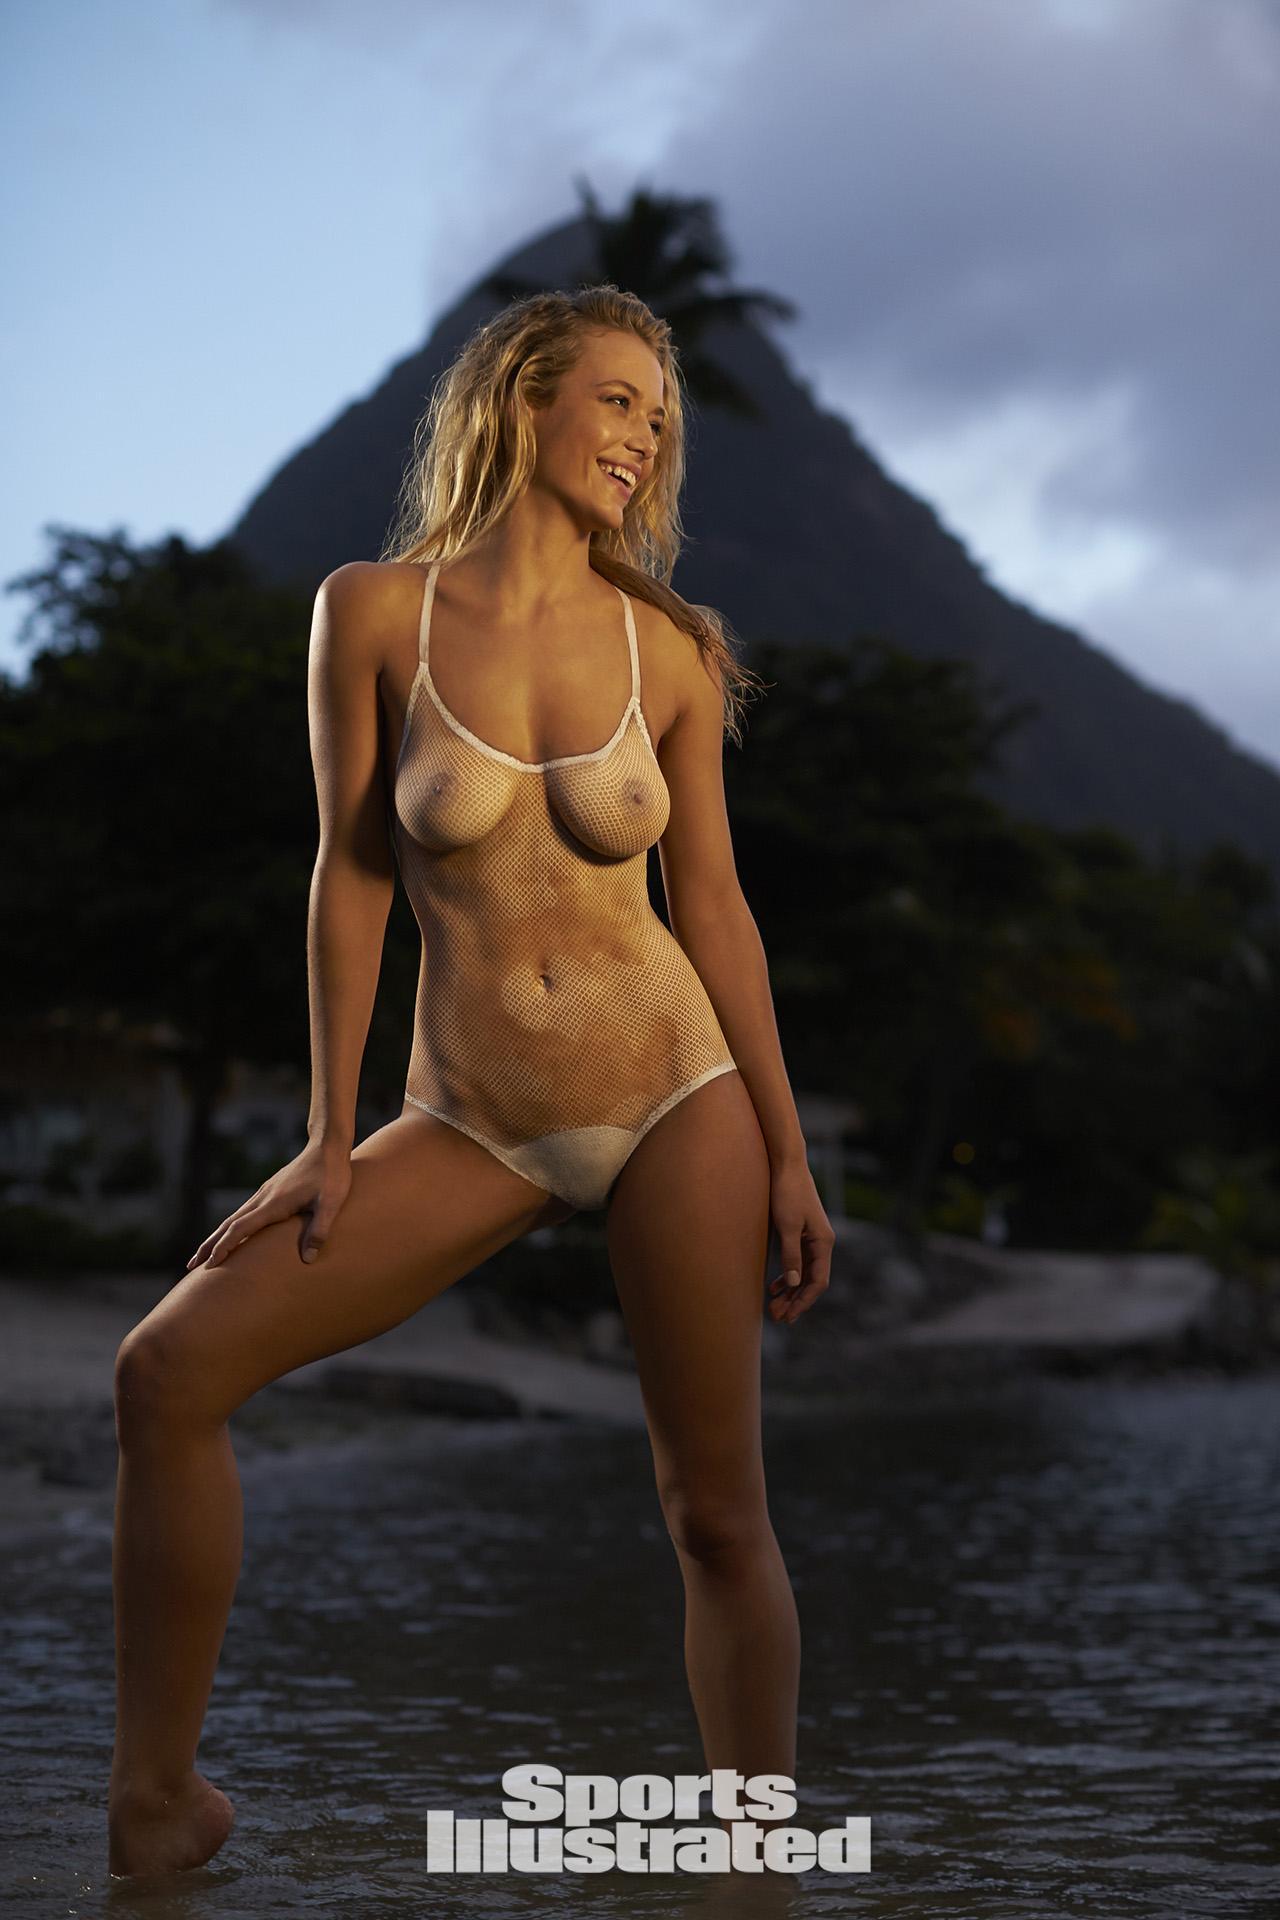 Keilih Stafford Nude Photos and Videos